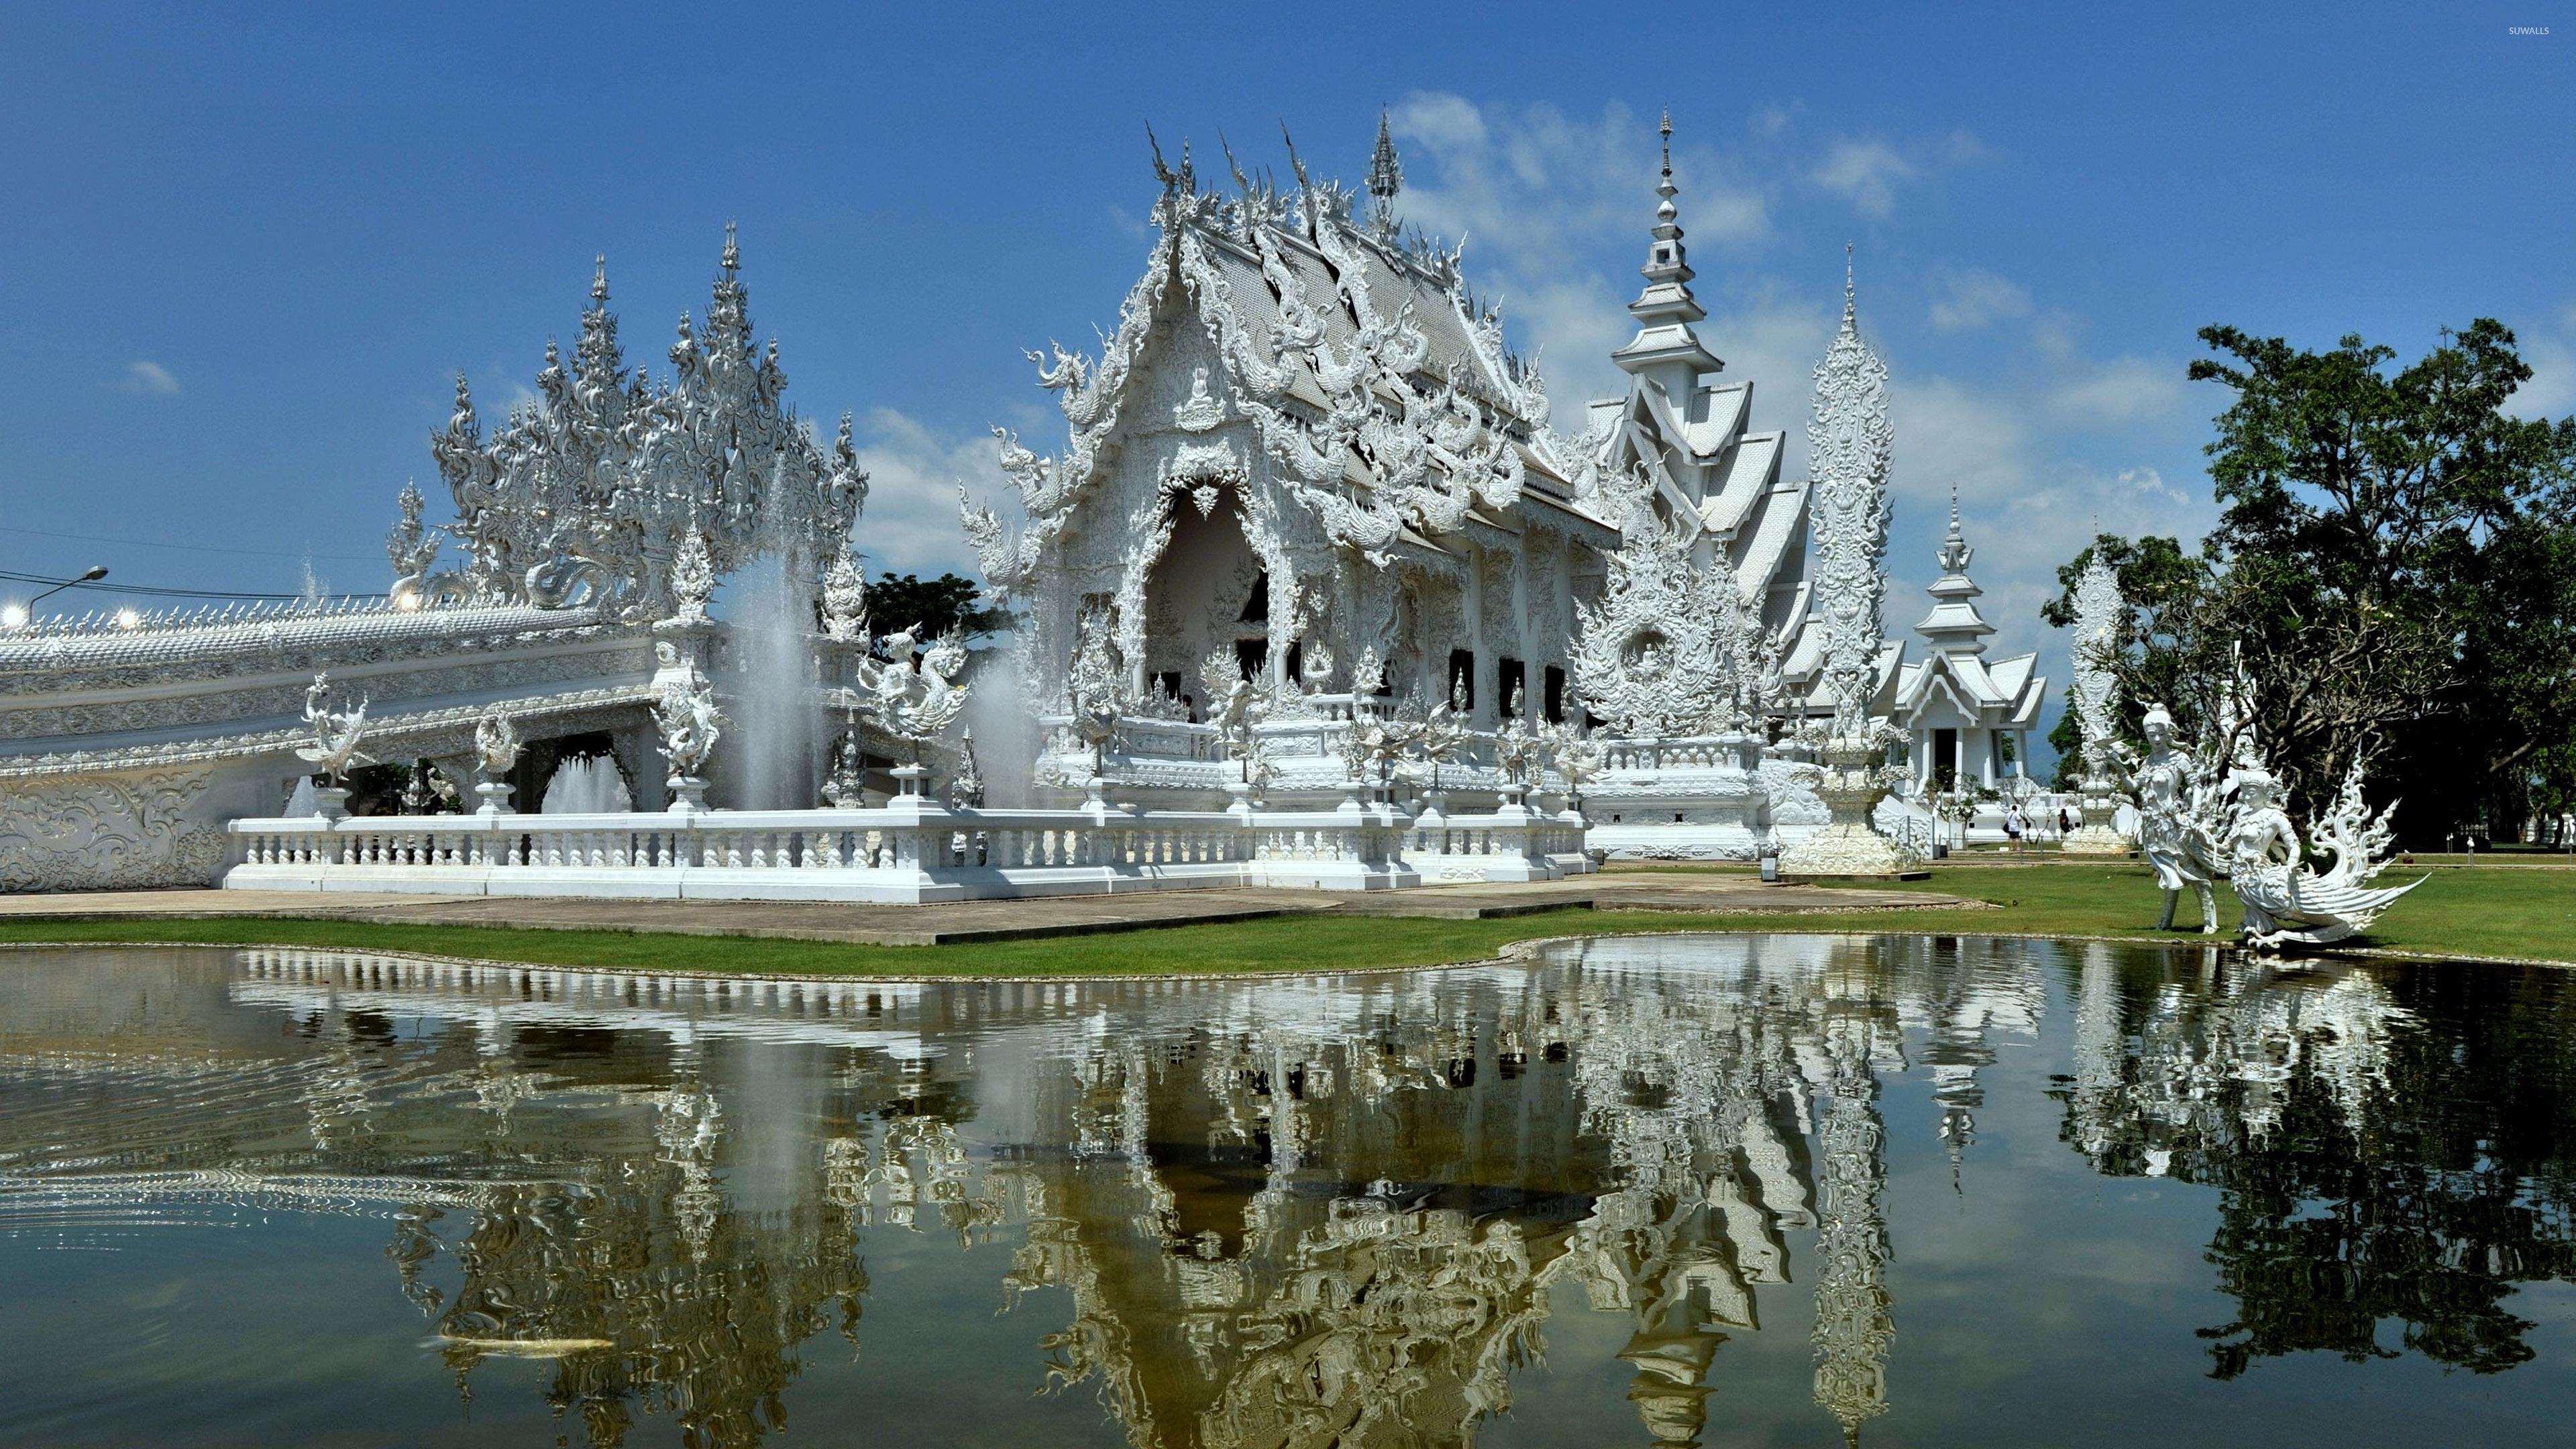 Wat Rong Khun wallpaper - World wallpapers - #37992